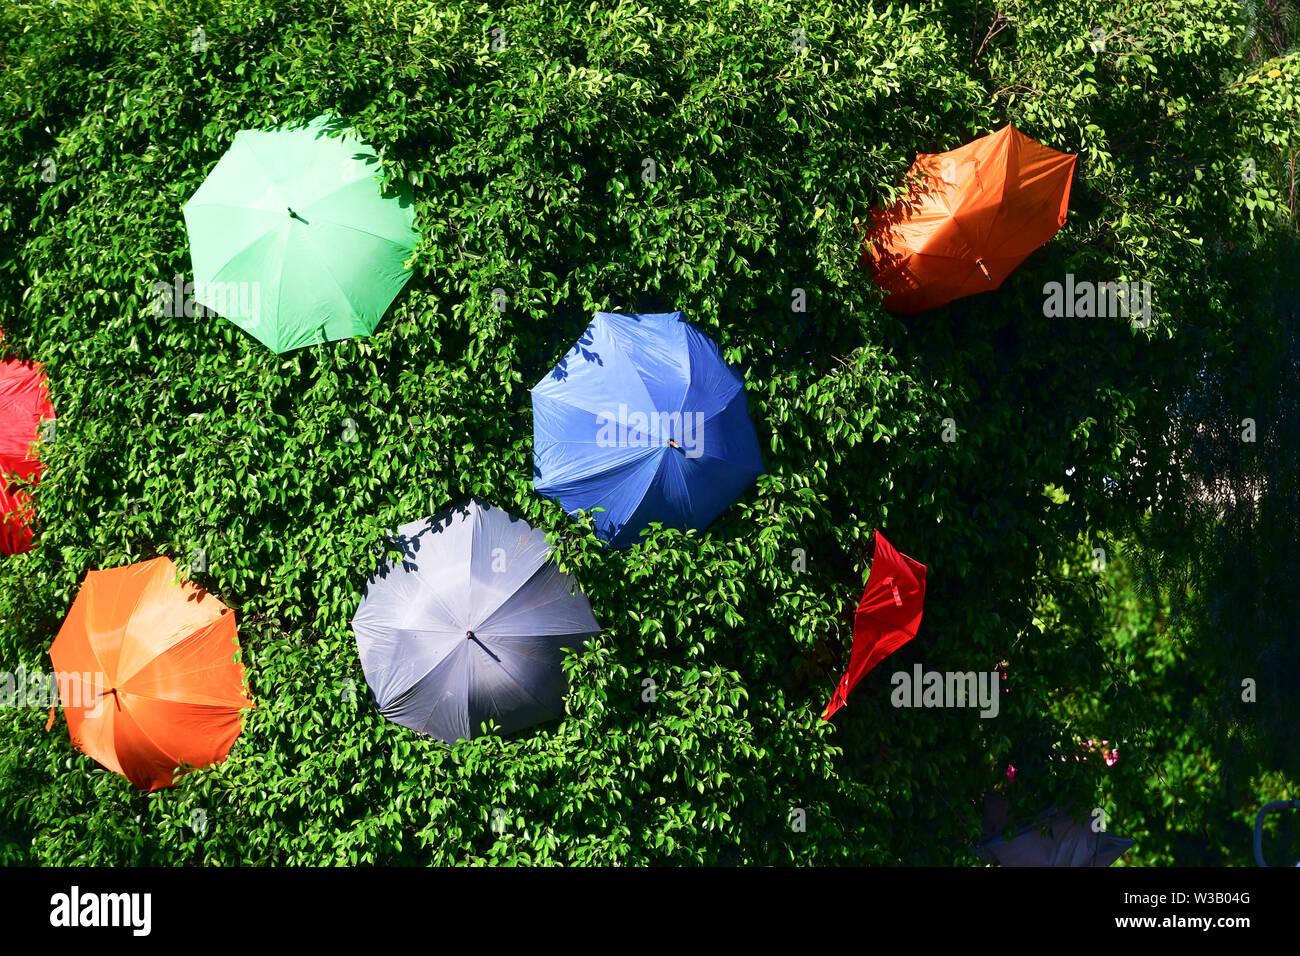 Zabbar. 13th July, 2019. Photo taken on July 13, 2019 shows umbrellas along a street to bring back the popular 'Umbrella Street' spectacle in Zabbar, Malta. Credit: Jonathan Borg/Xinhua/Alamy Live News - Stock Image